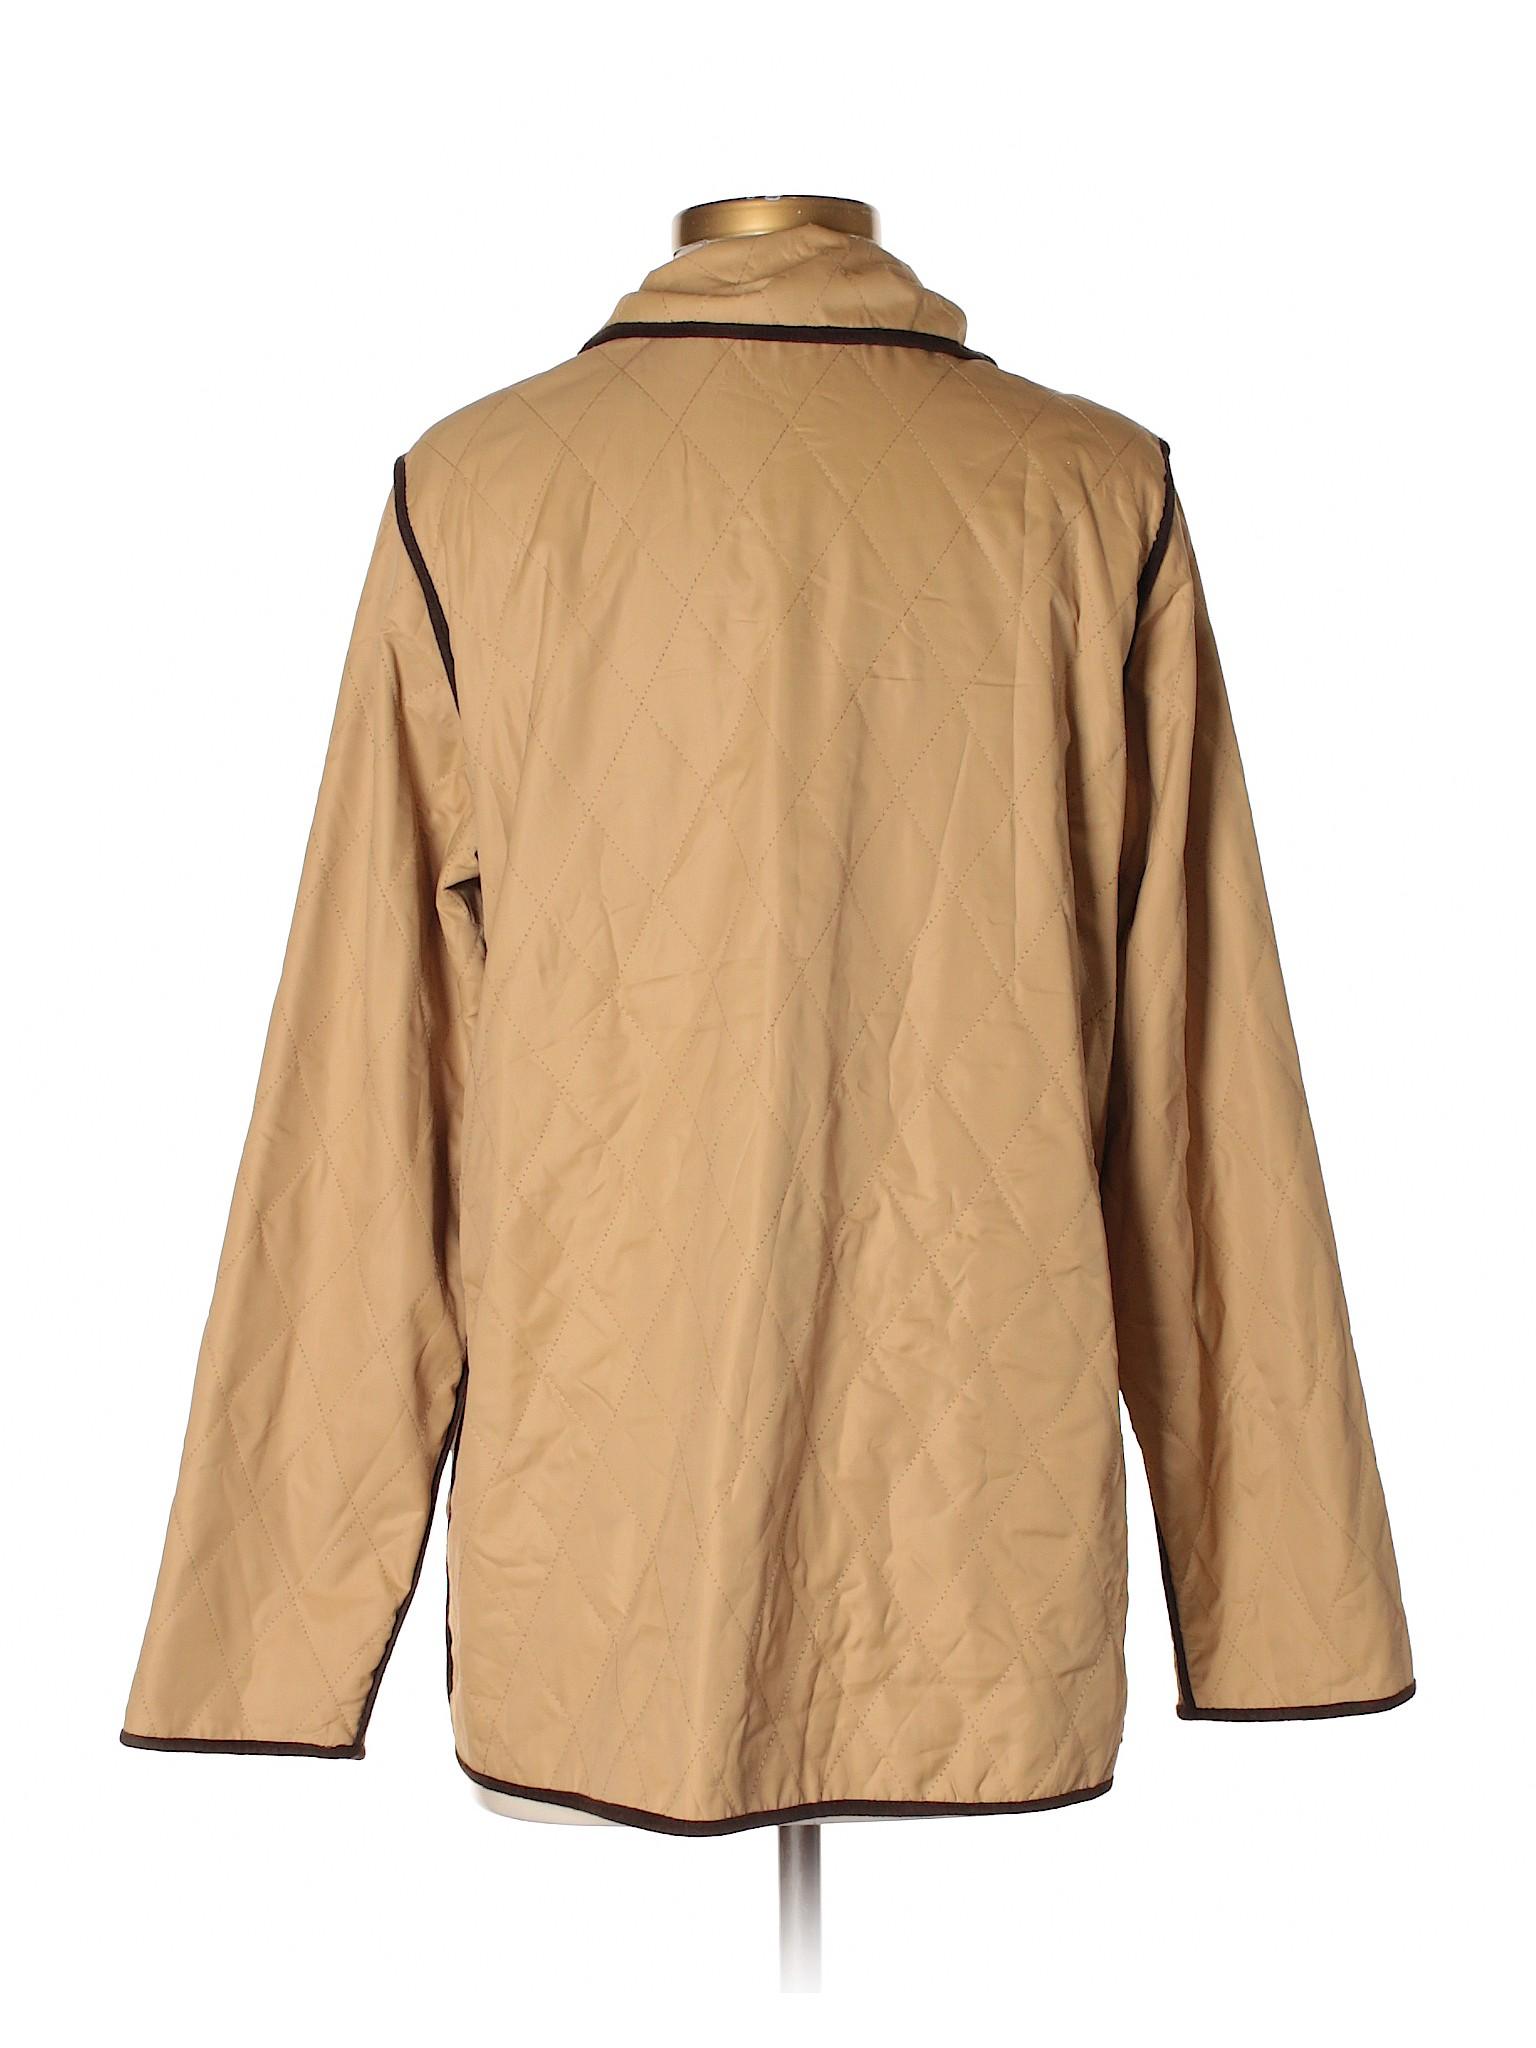 Centigrade Boutique Centigrade Boutique Boutique Boutique Centigrade Centigrade Jacket Jacket Jacket Boutique Jacket WSvAtnx0